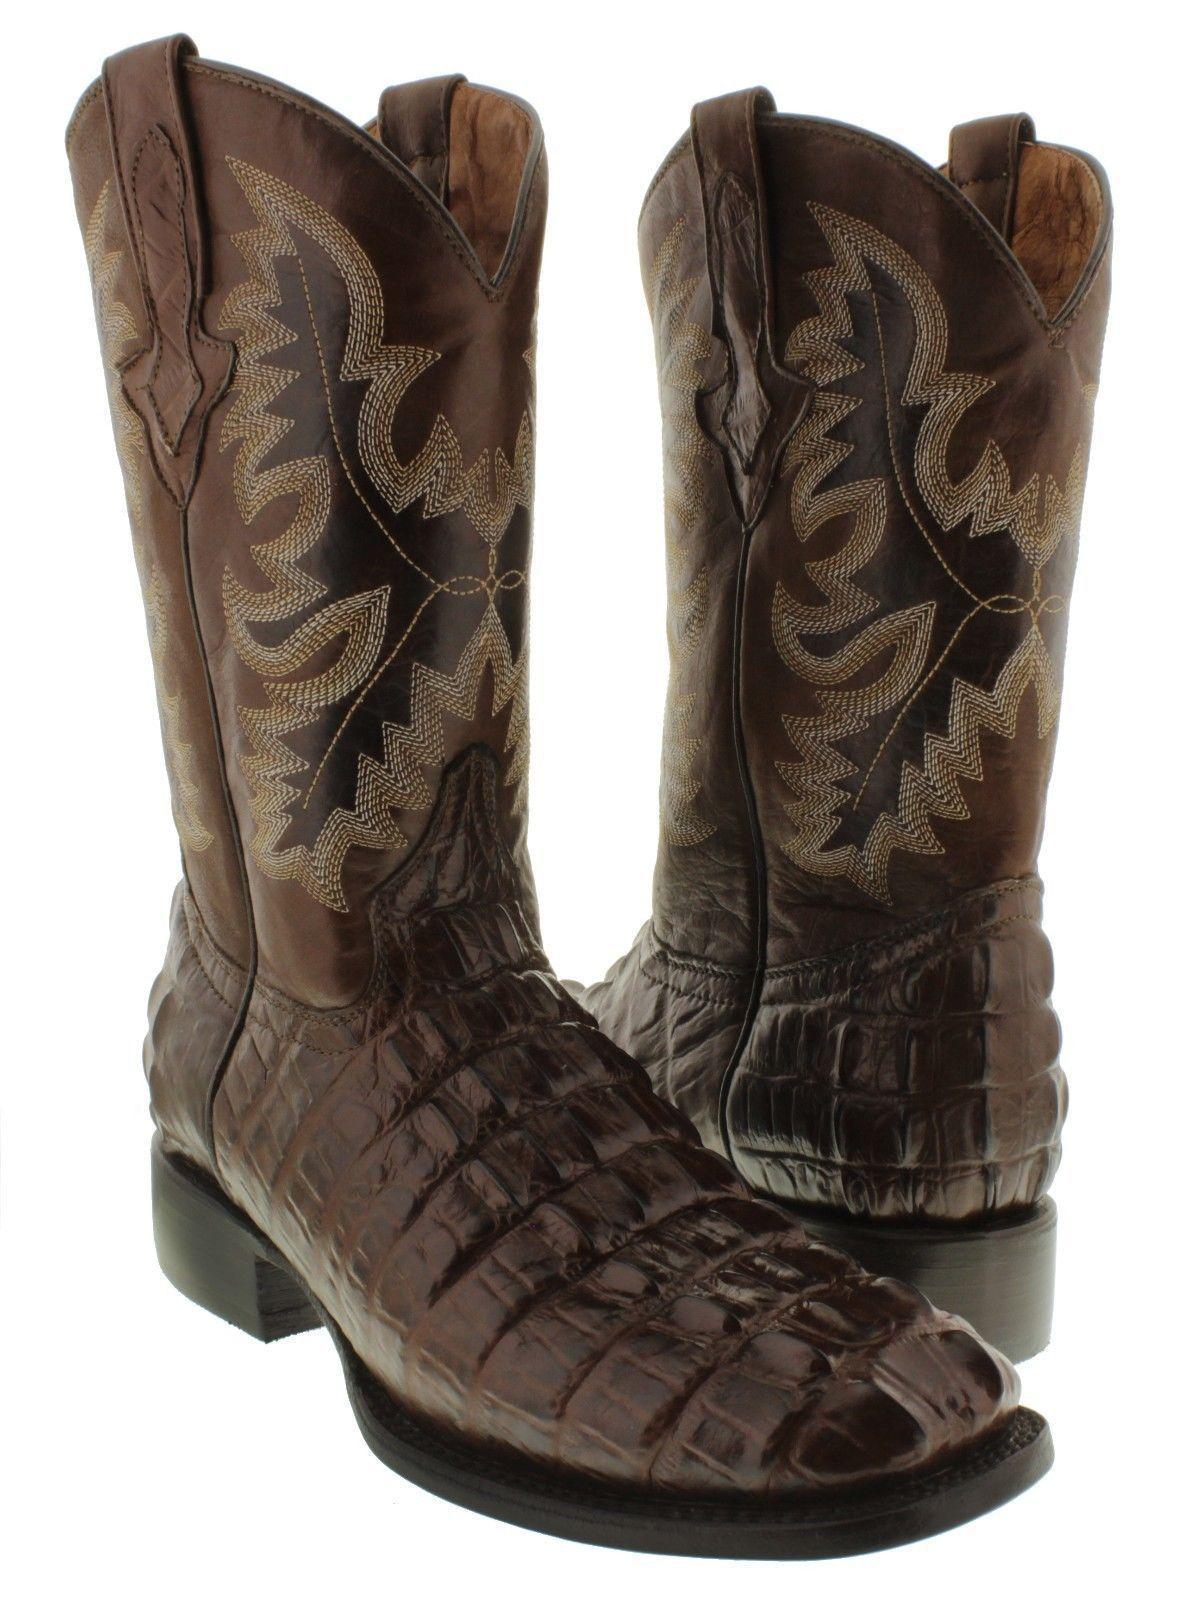 f7bb61c50287 S l1600. S l1600. Mens Dark Brown Crocodile Alligator Tail Leather Design  Square Toe Cowboy Boots